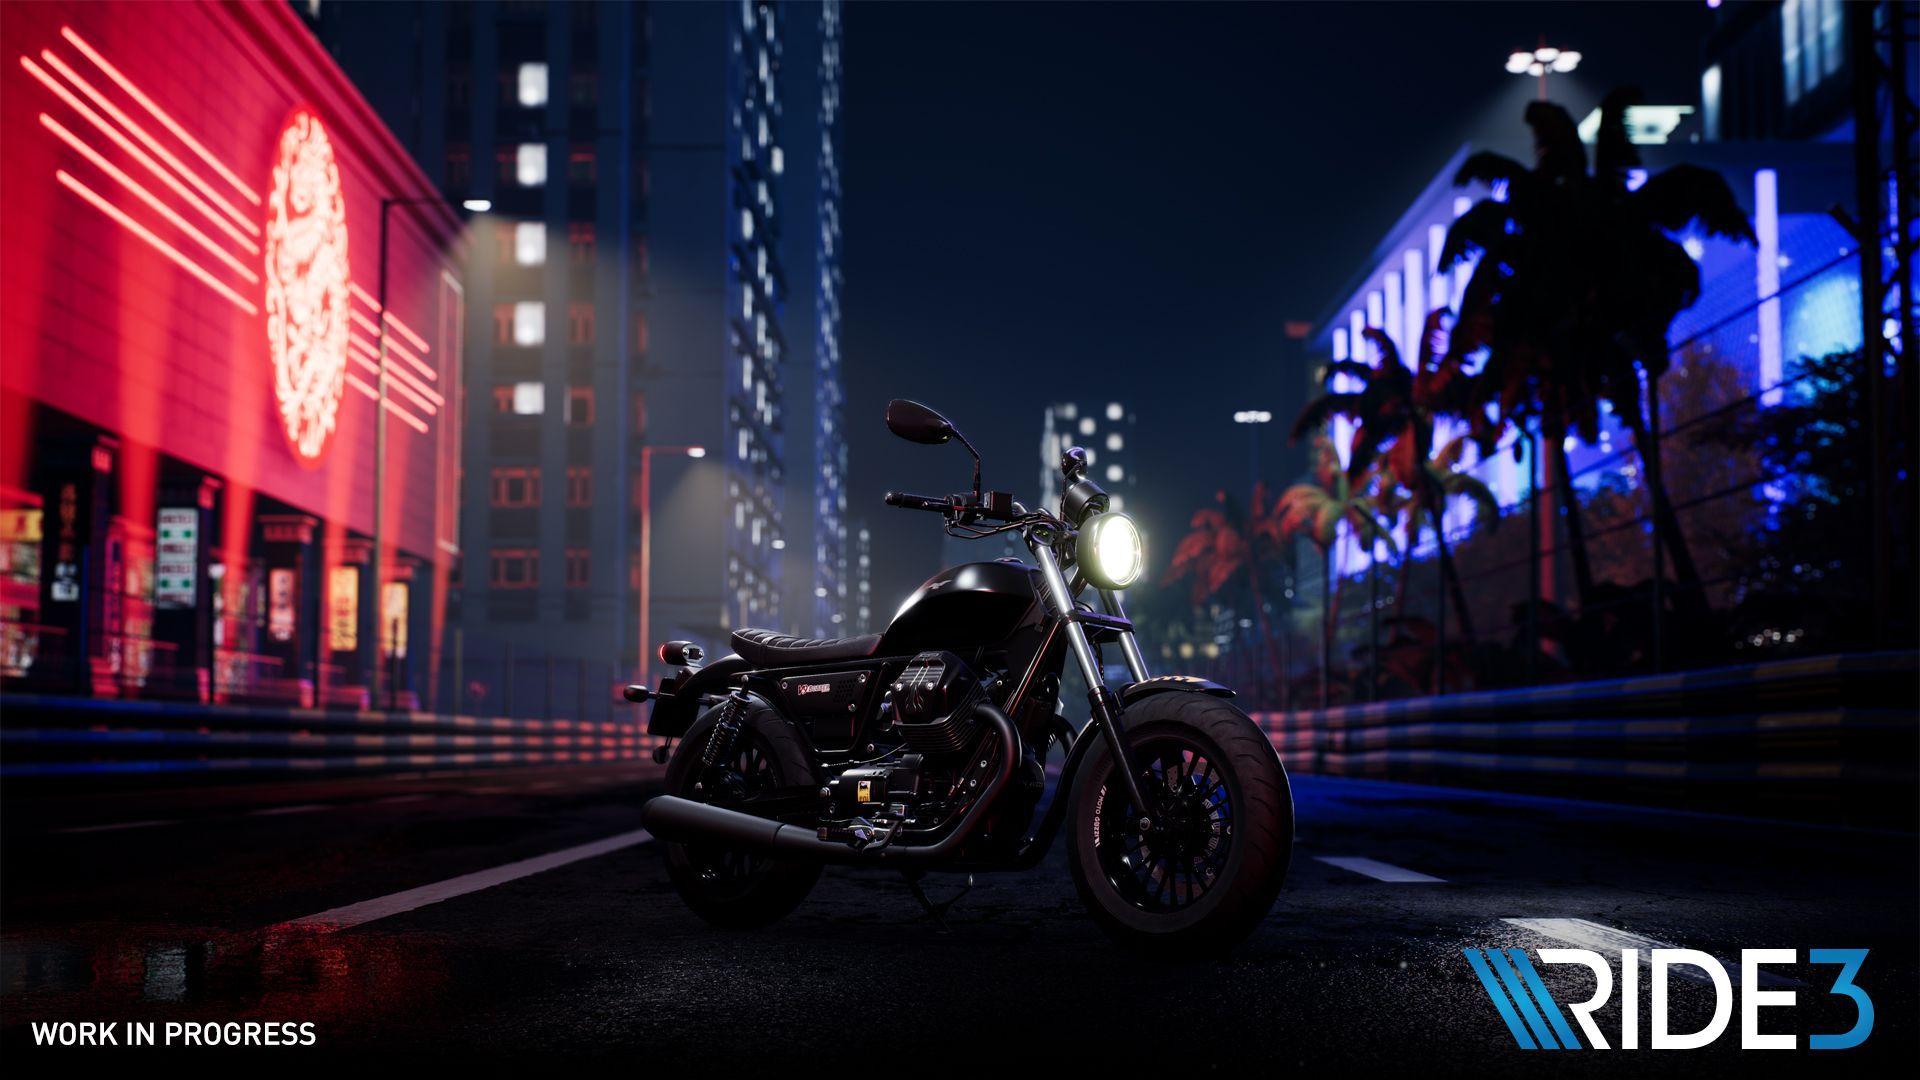 Ride 3 (PC) - 4